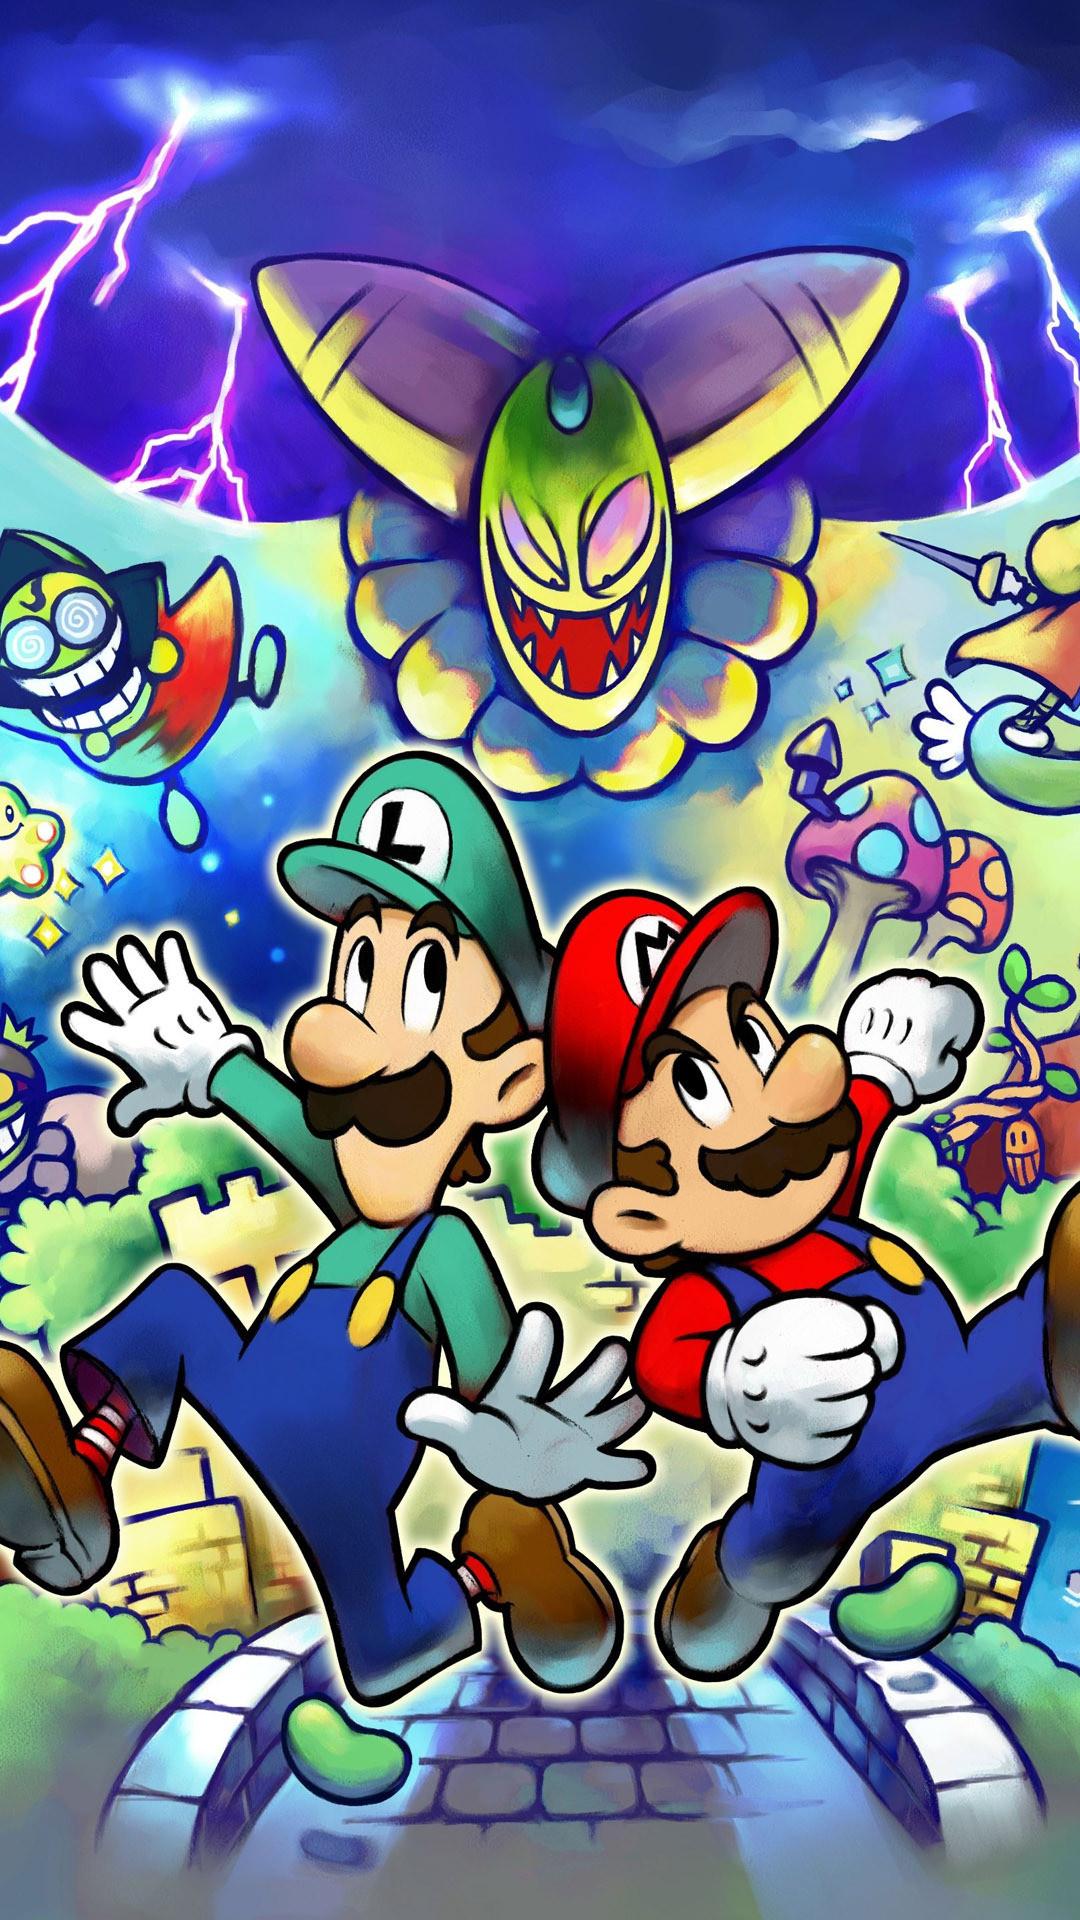 Super Mario Bros APK Download Latest 2020 Version ...